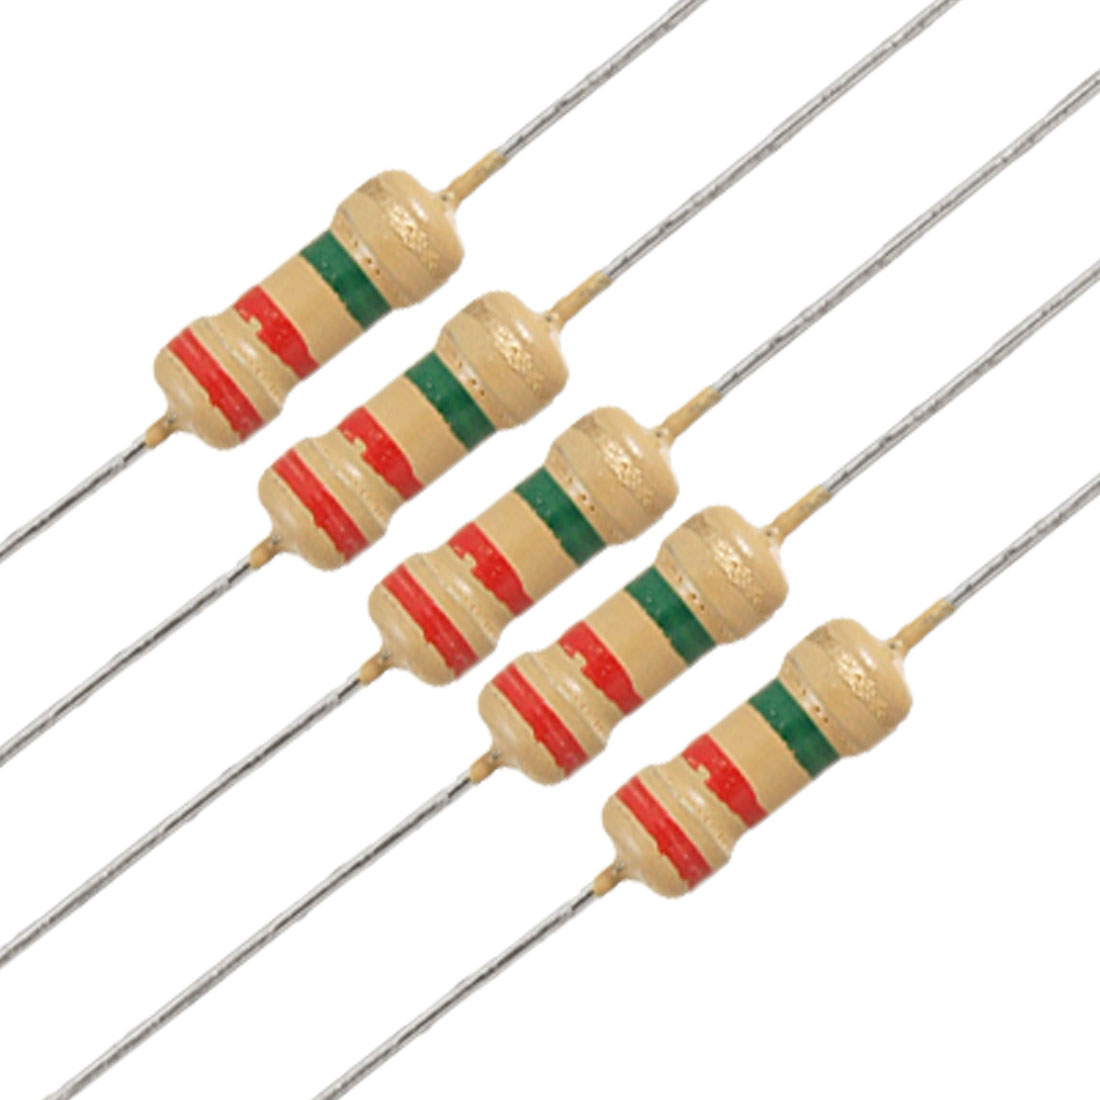 50 x 1/4W 250V 2.2 ohm 2M2 Axial Lead Carbon Film Resistors